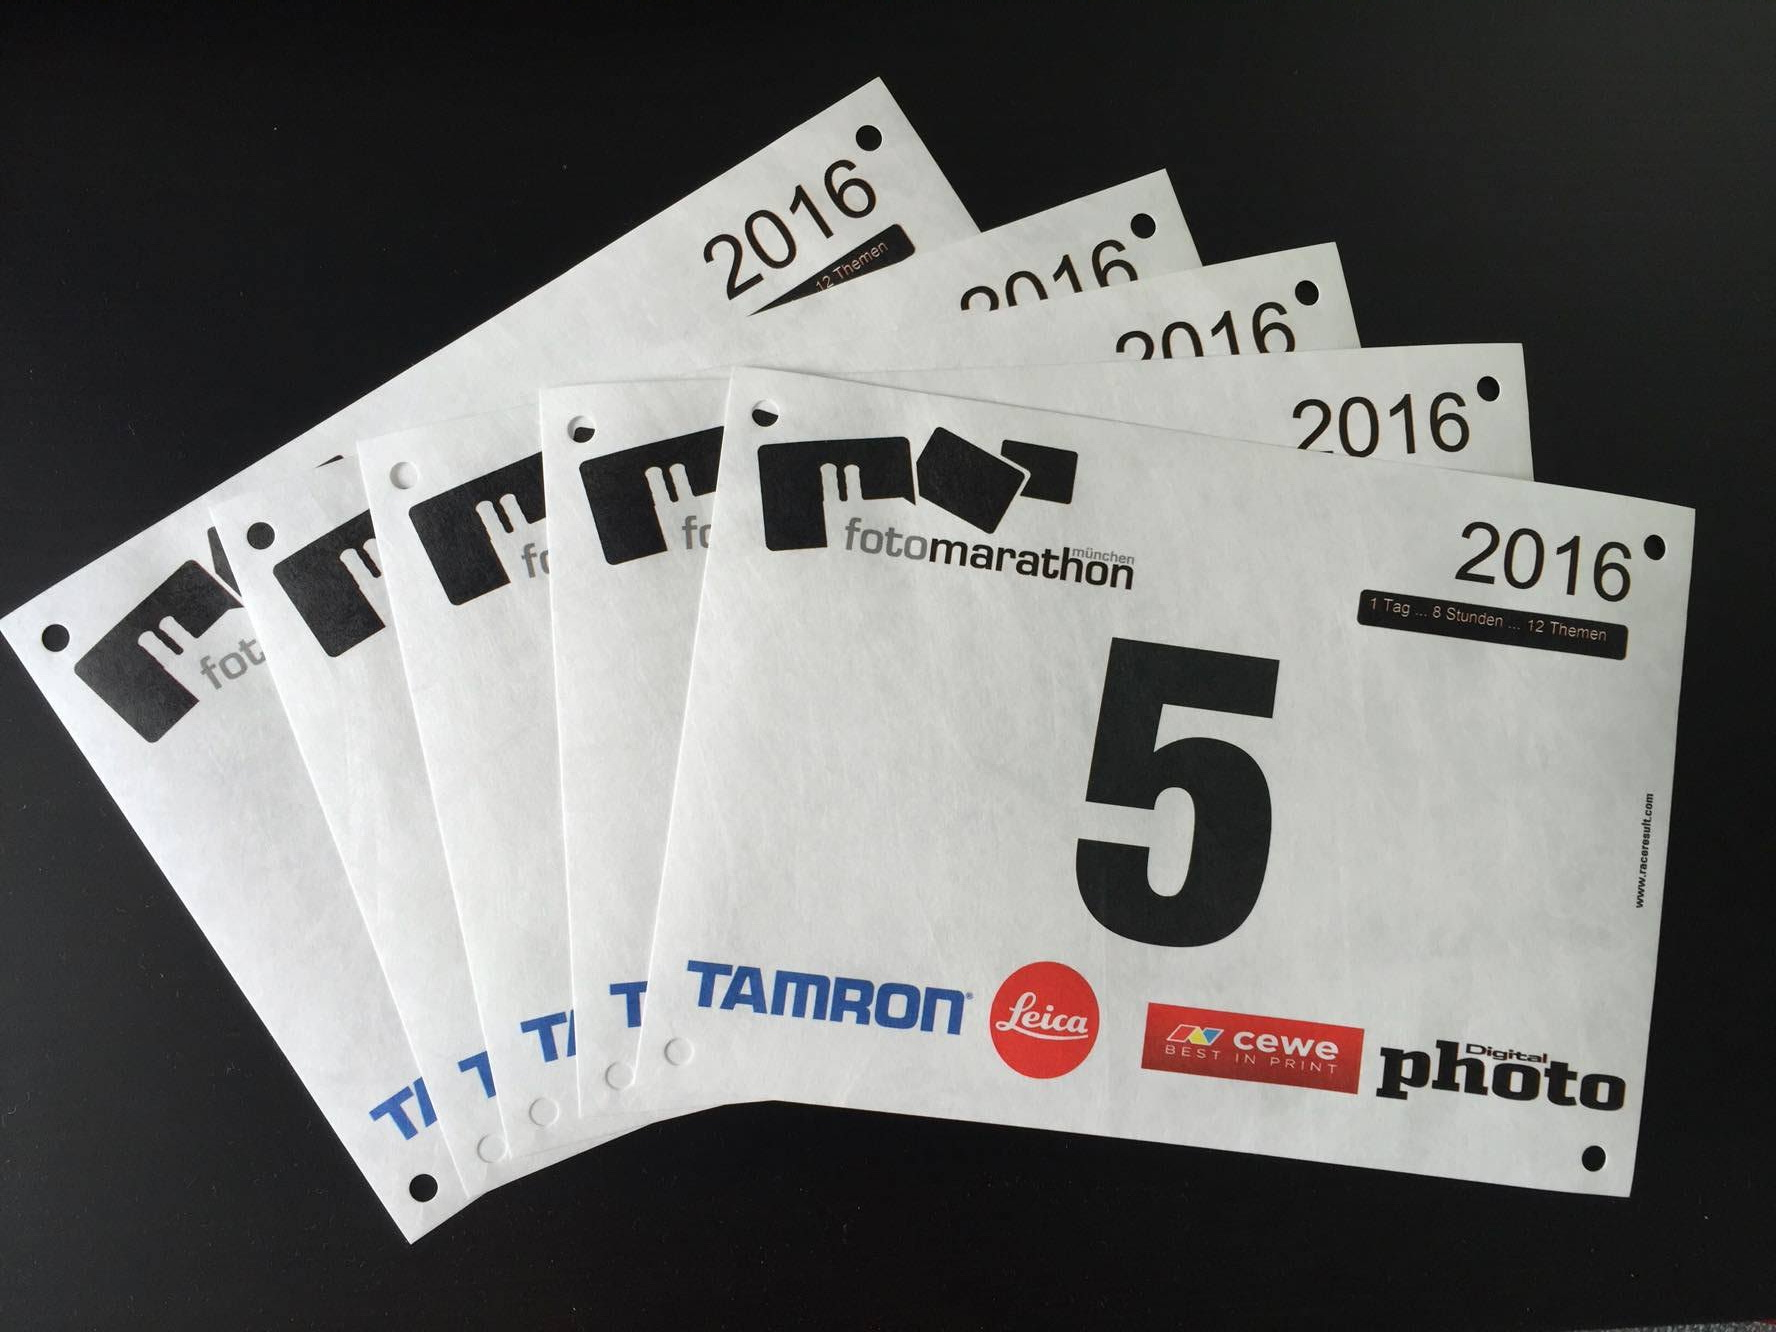 Alle gültigen Serien des Fotomarathons 2016